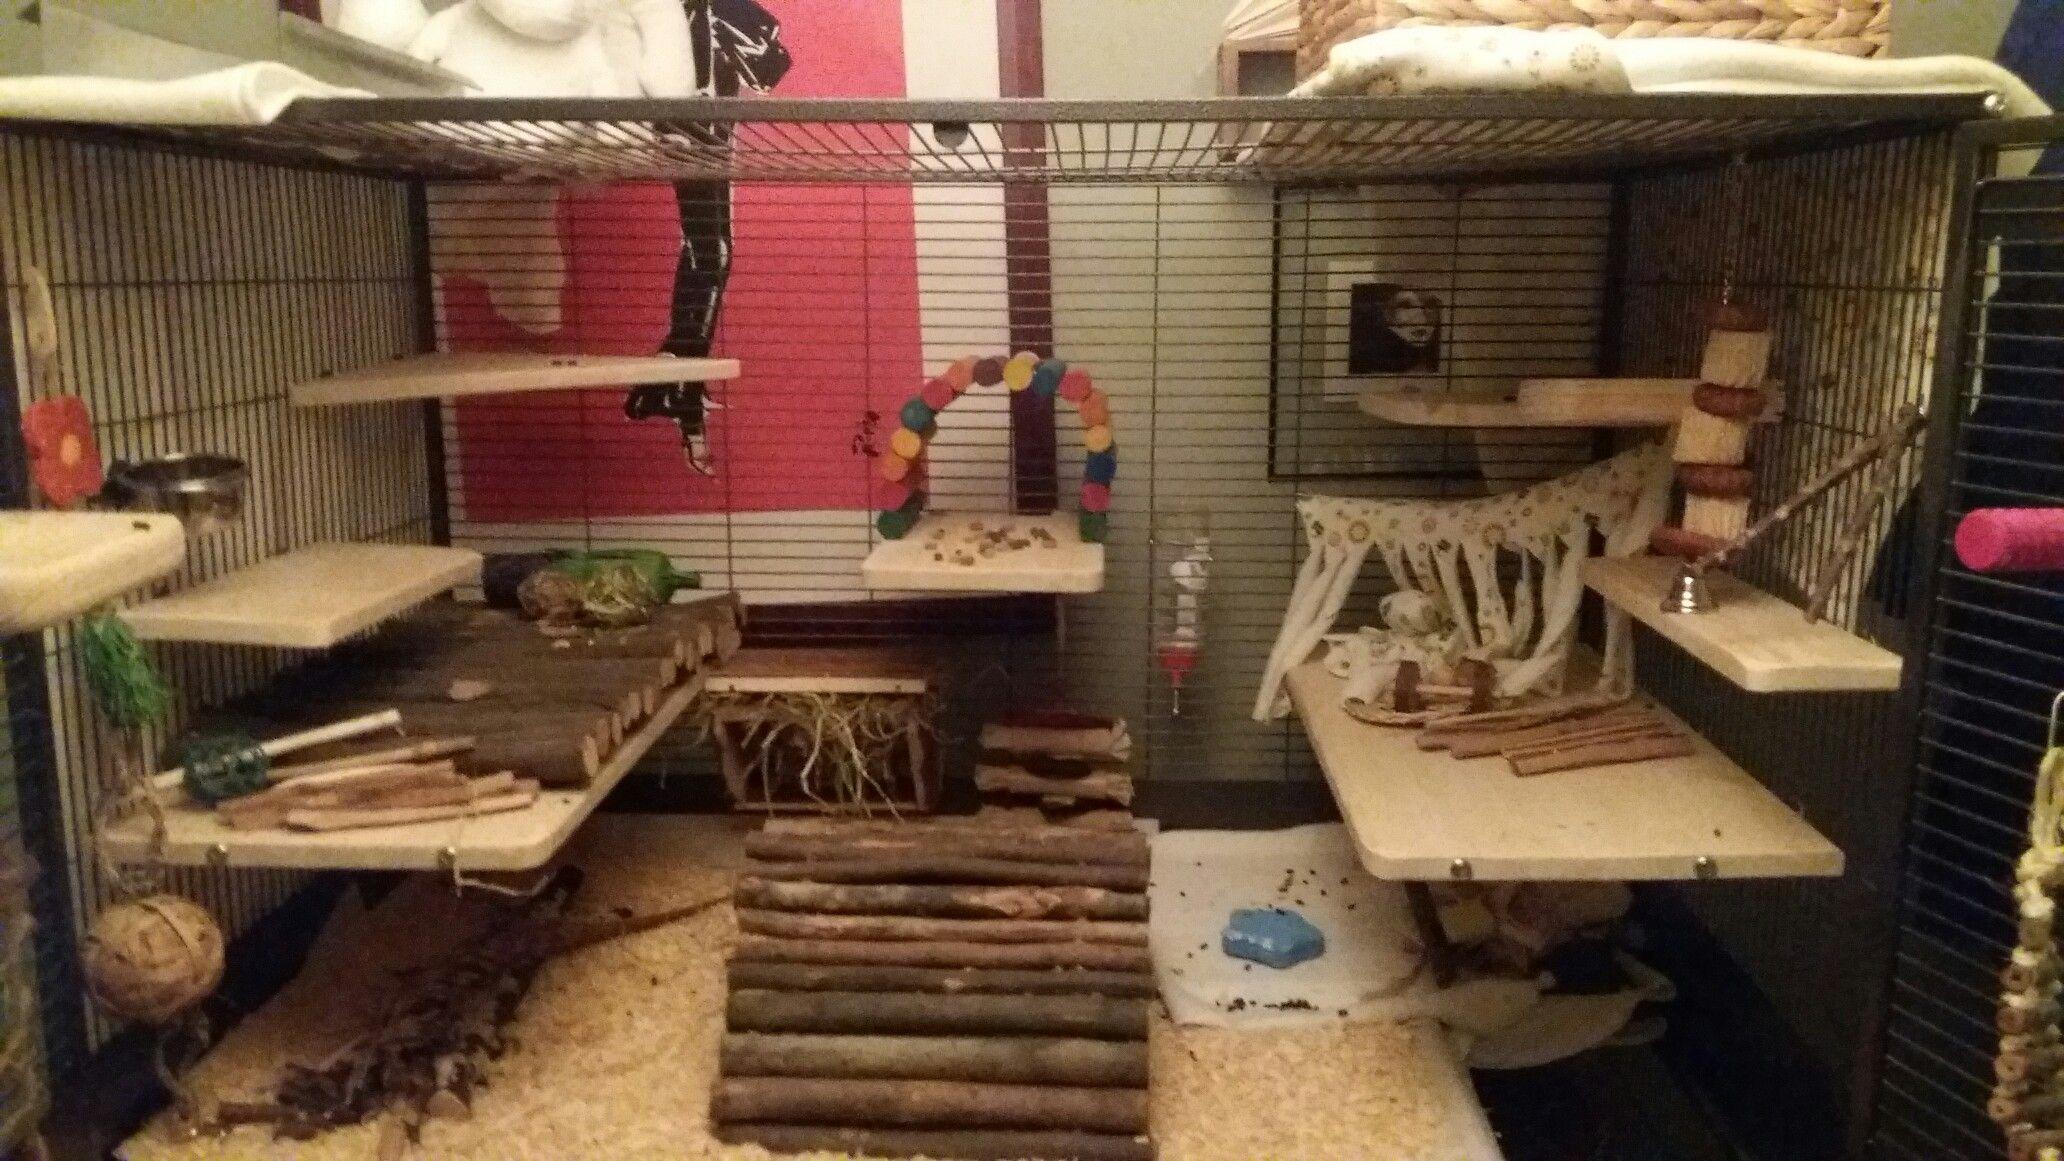 Top of chinchilla cage